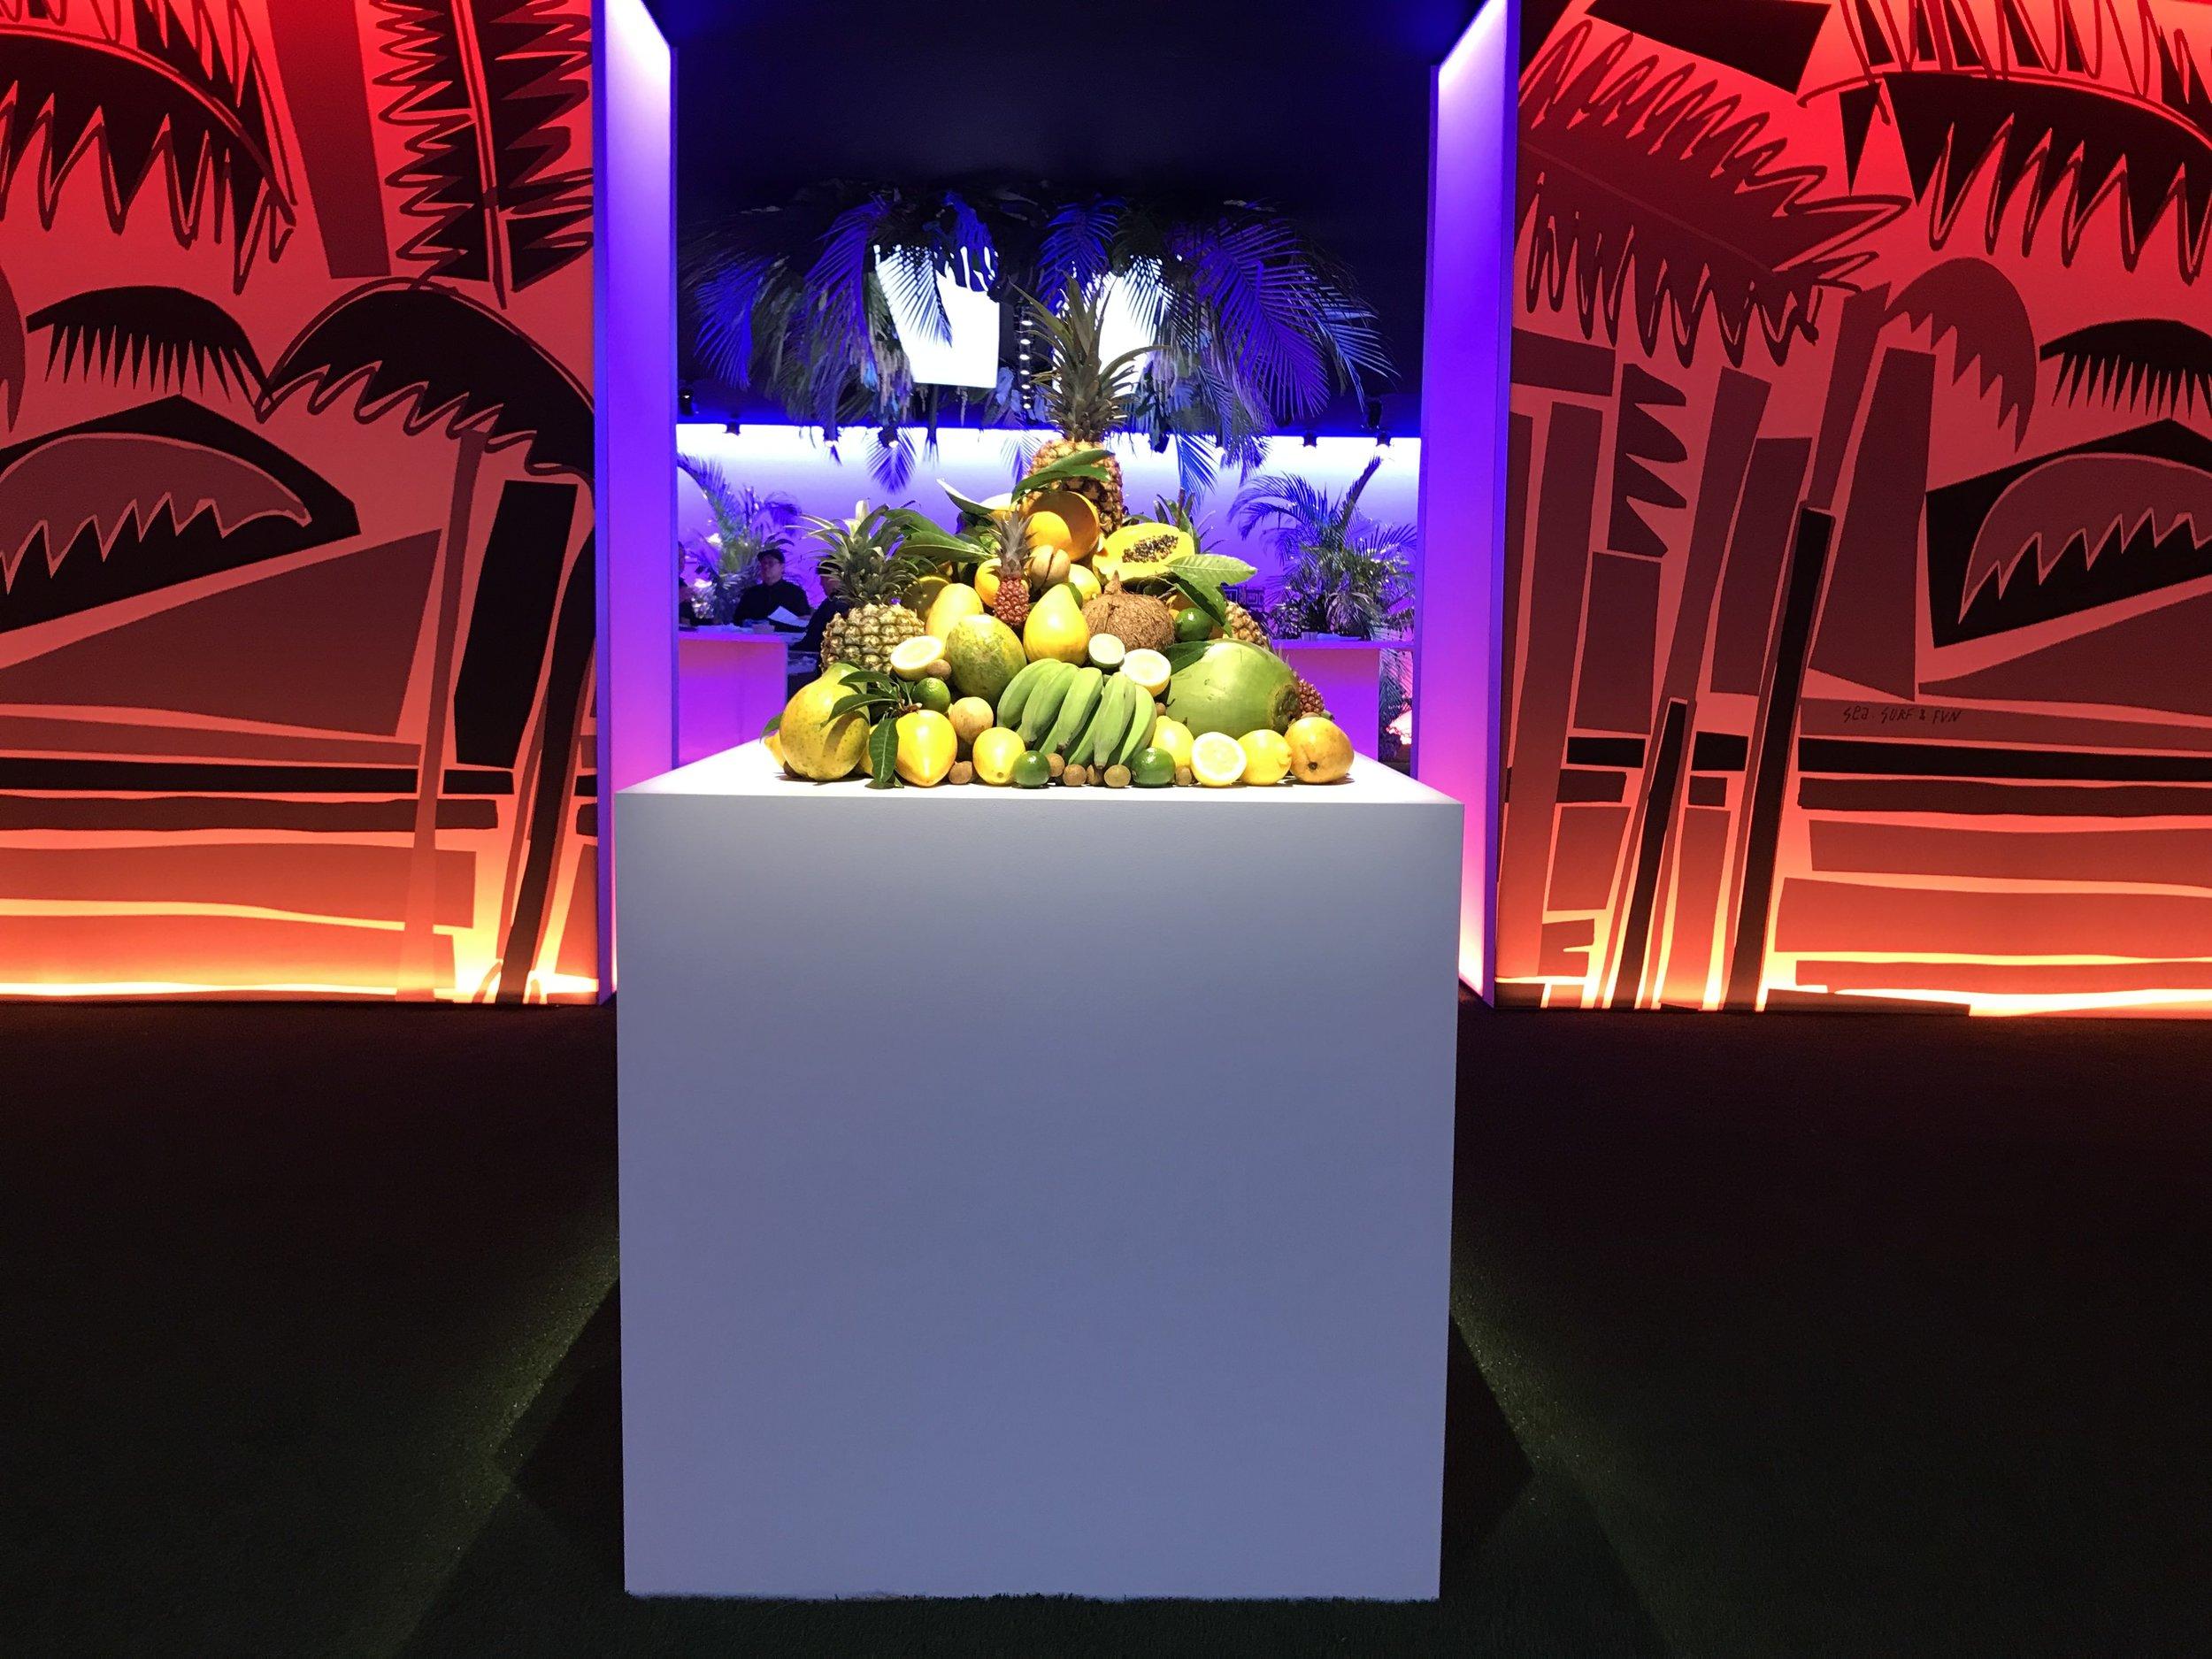 Curate-Hermes-Waikiki-Fruit-Display.jpeg